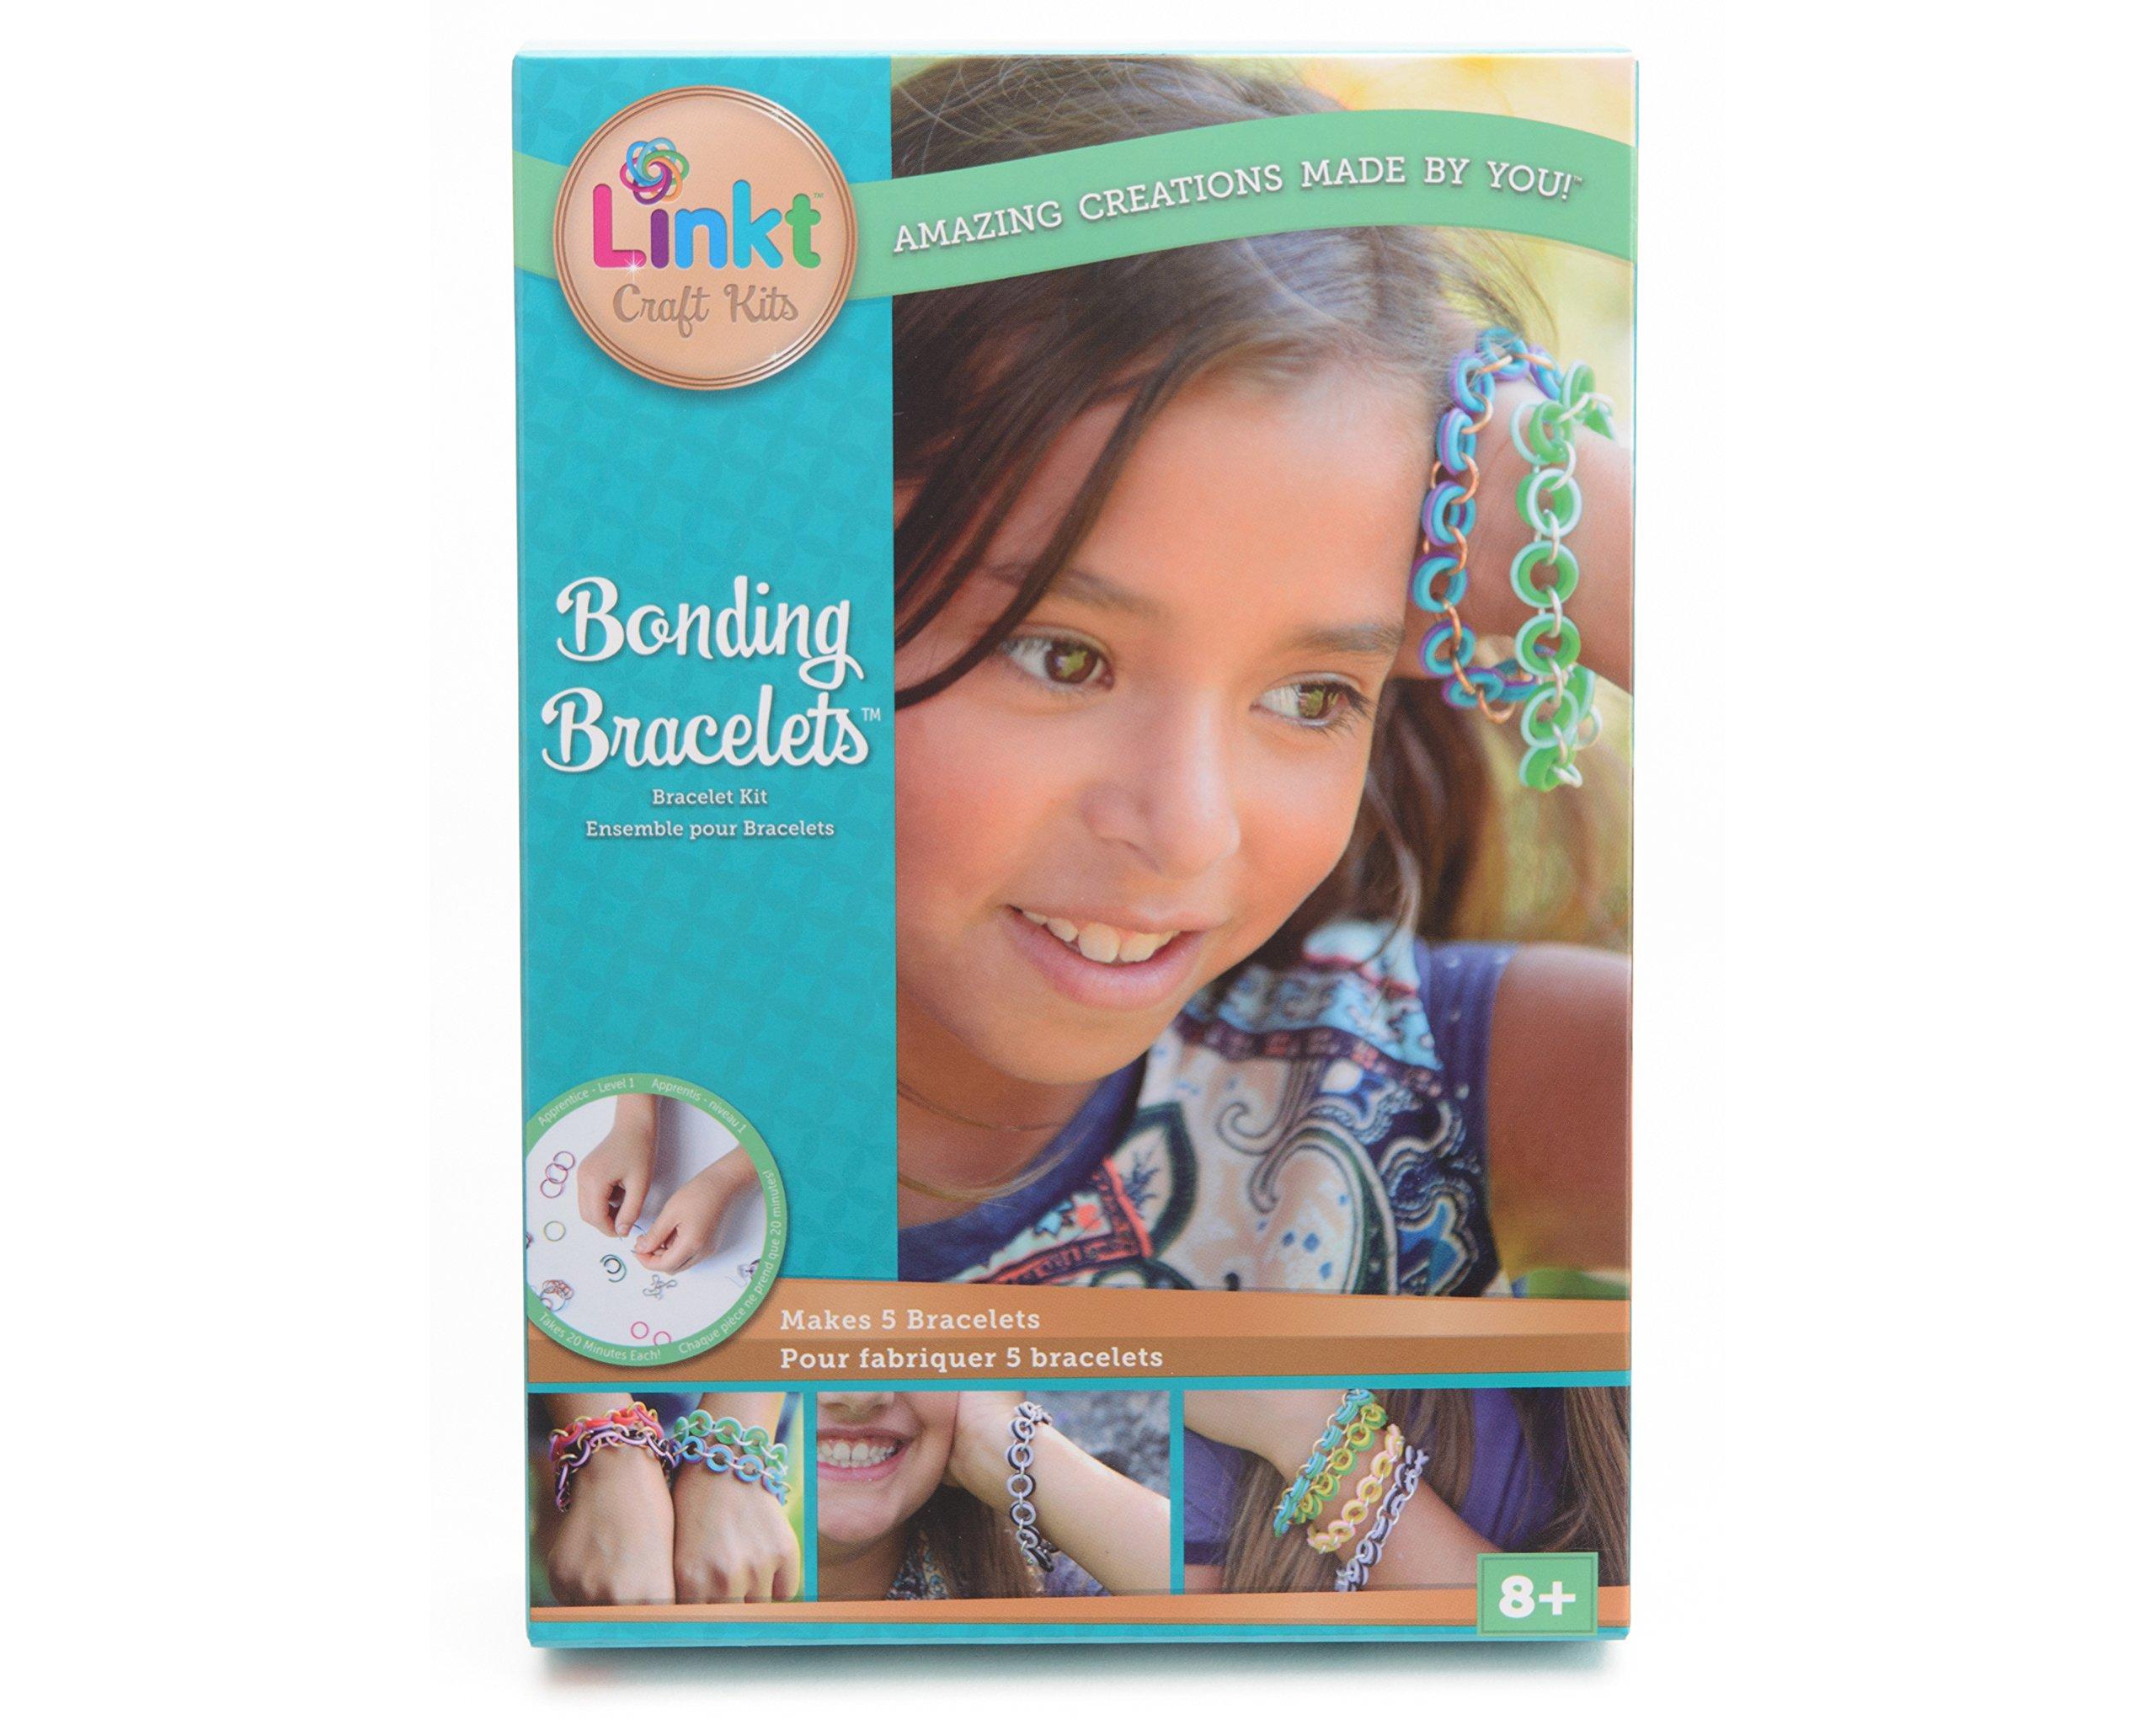 Linkt Craft Kit Bonding Bracelet (5 Bracelets)